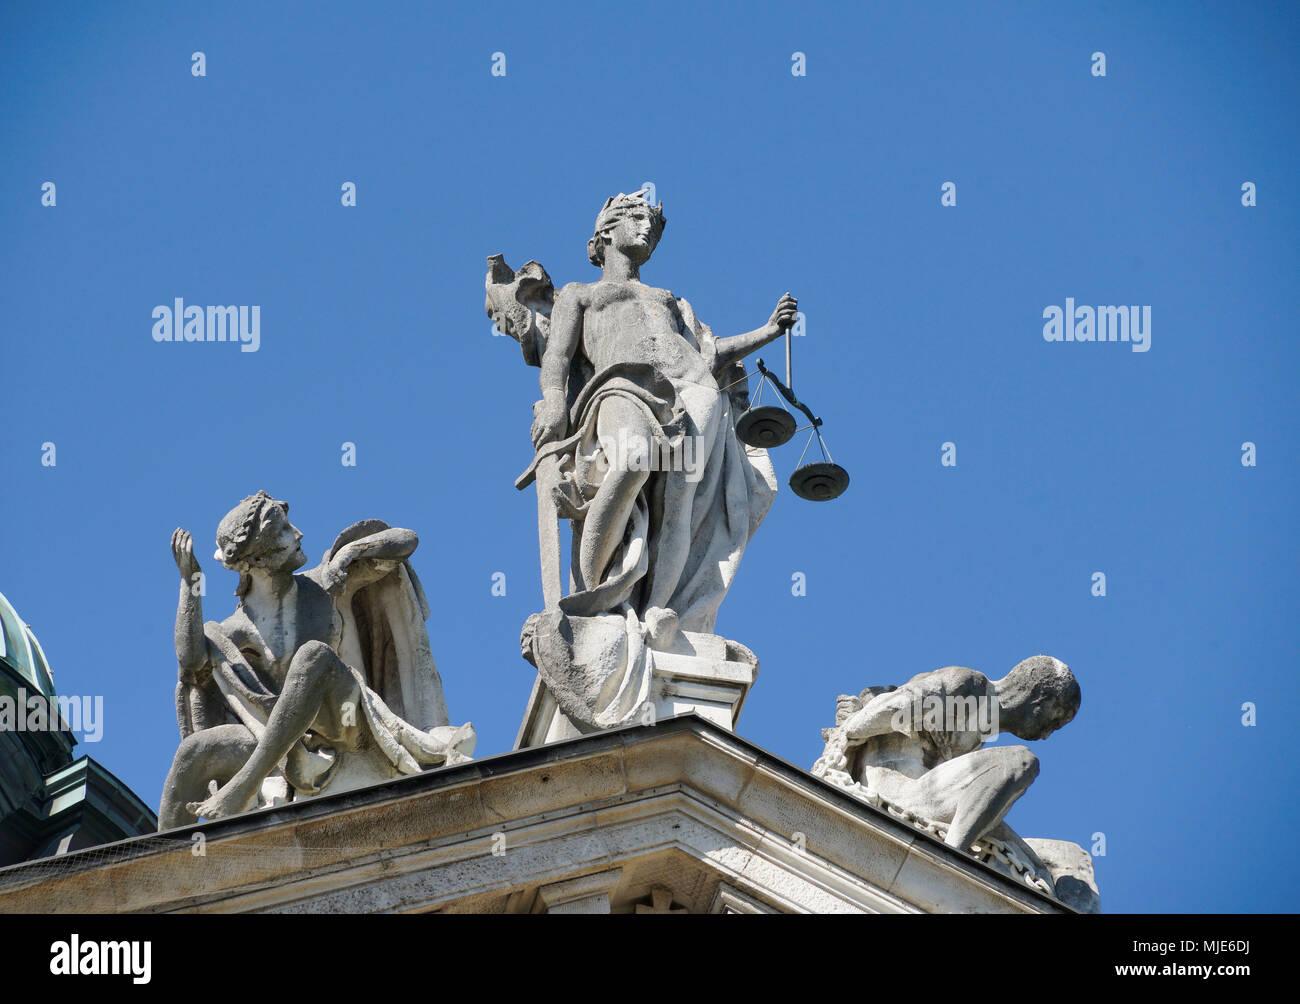 Justizpalast 'Am Stachus', Lady Justice, statue, Munich, Bavaria, Germany - Stock Image